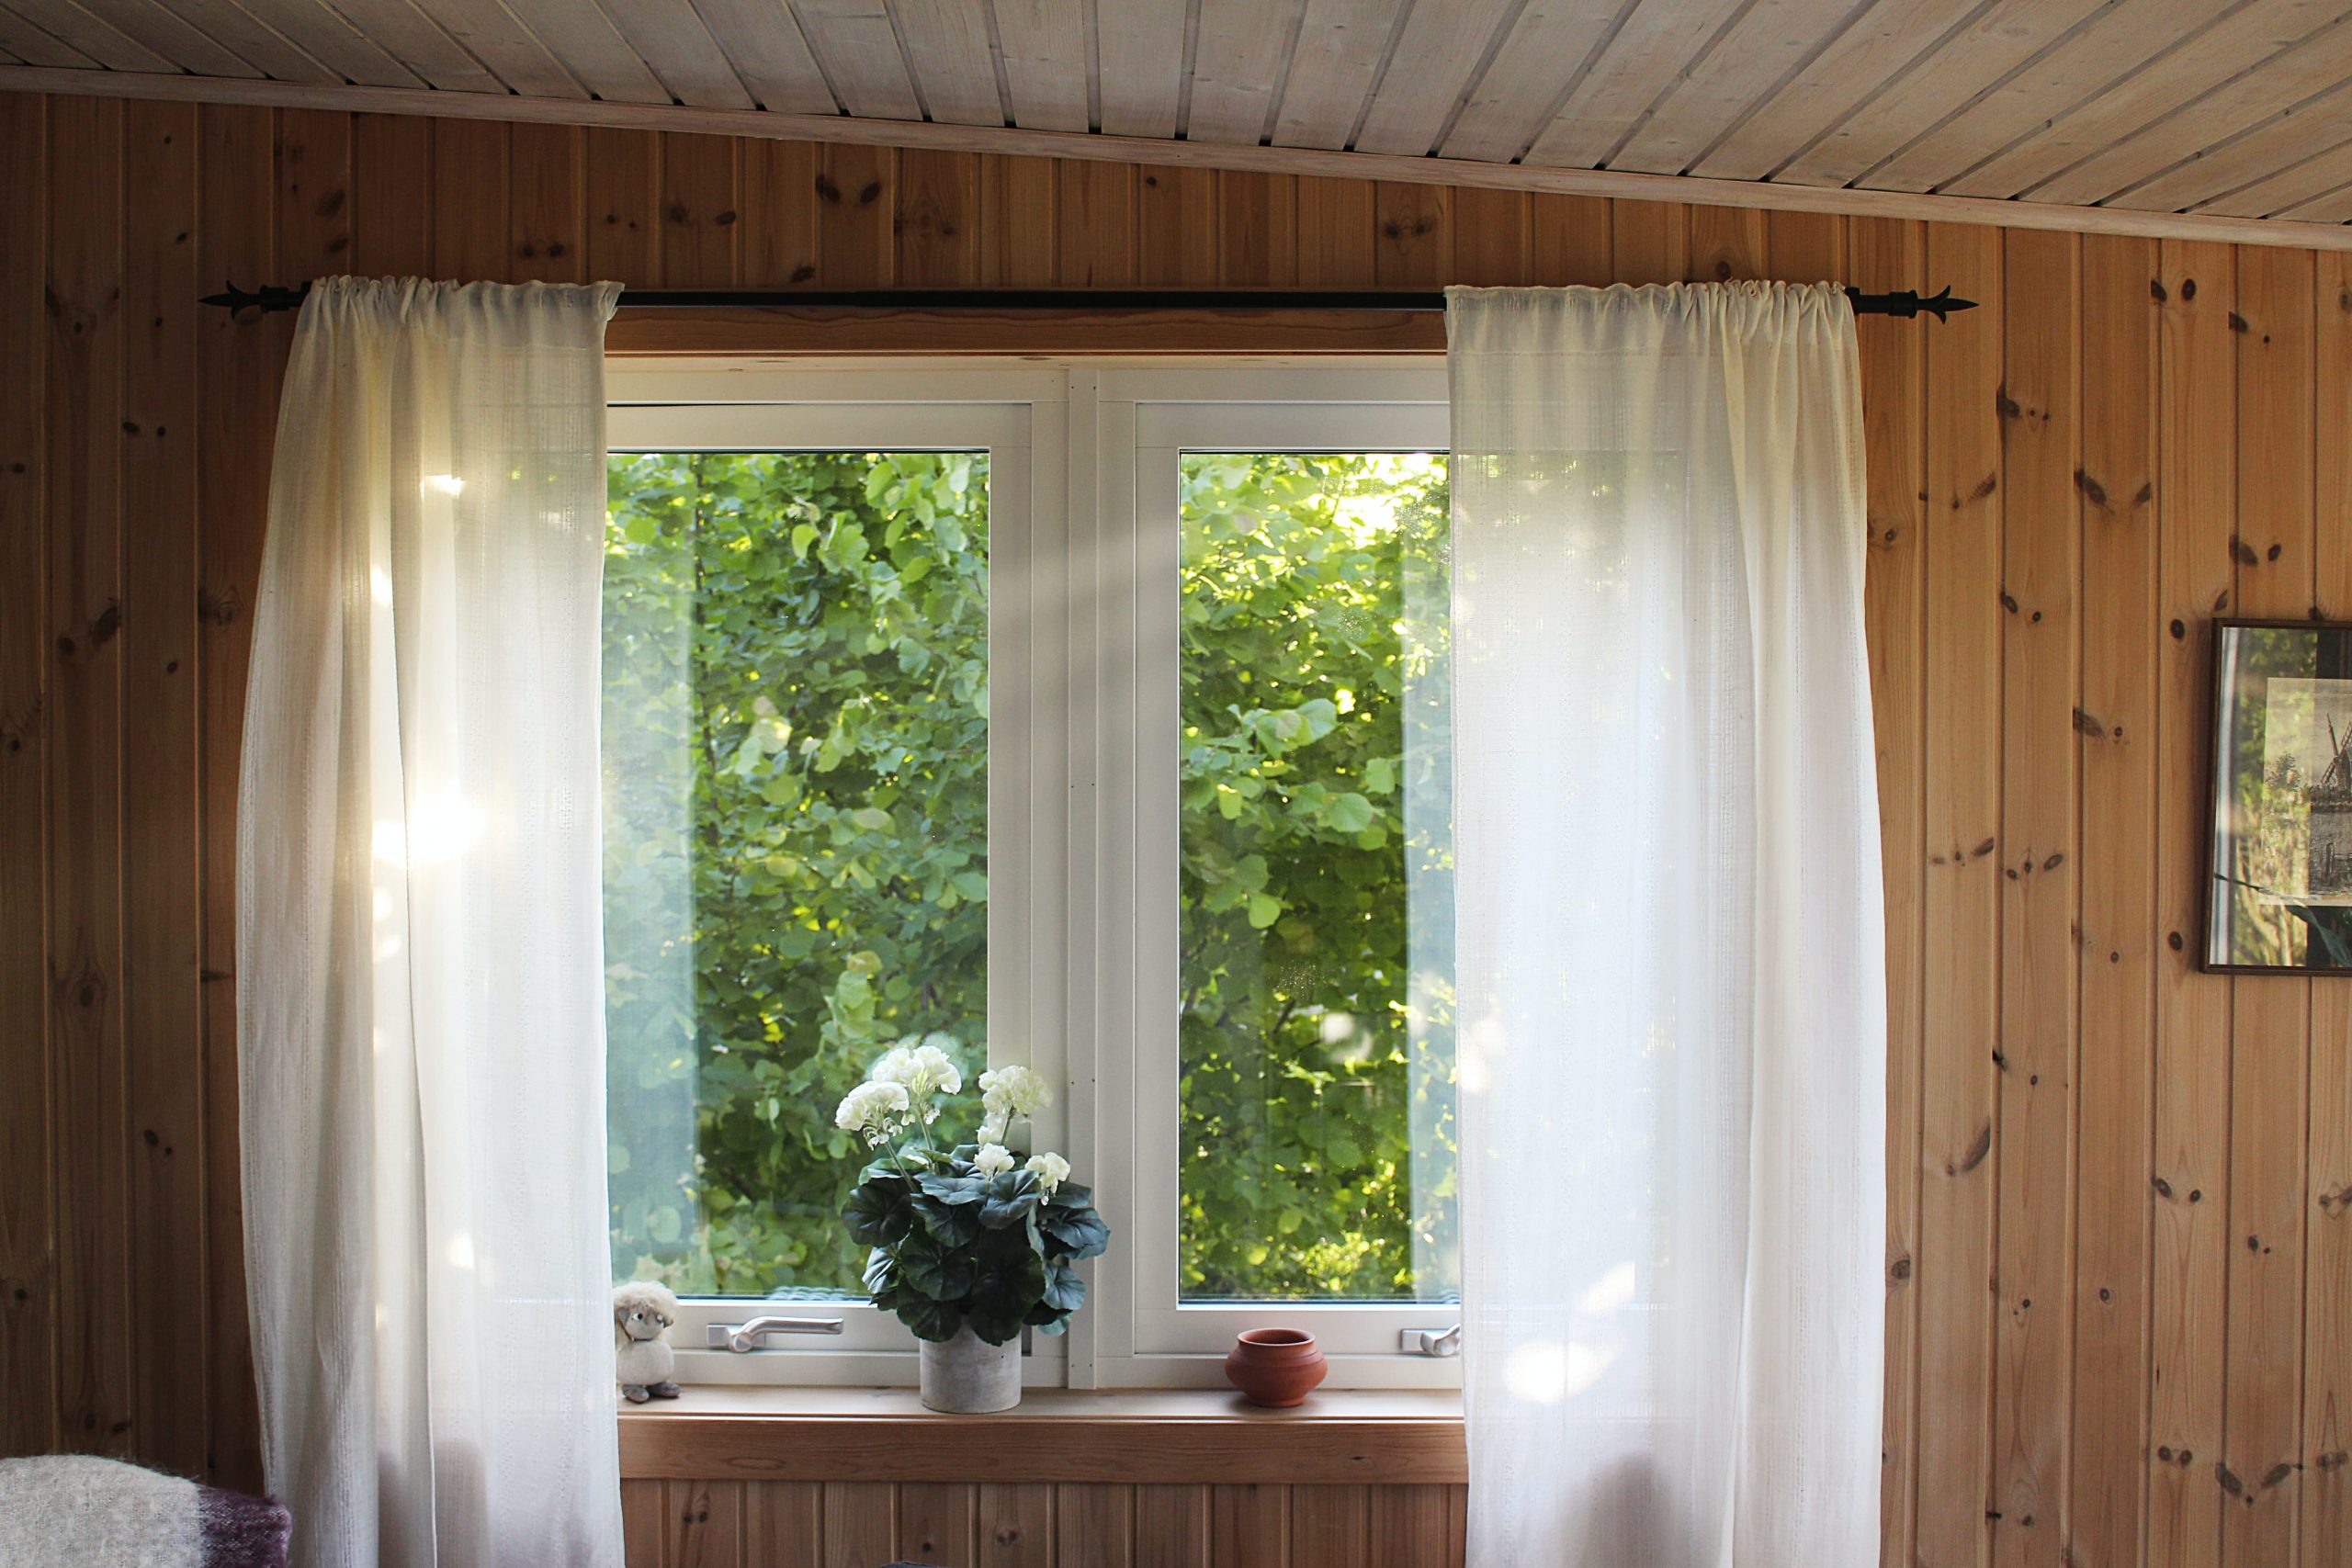 Ventanas de aluminio con cortinas blancas